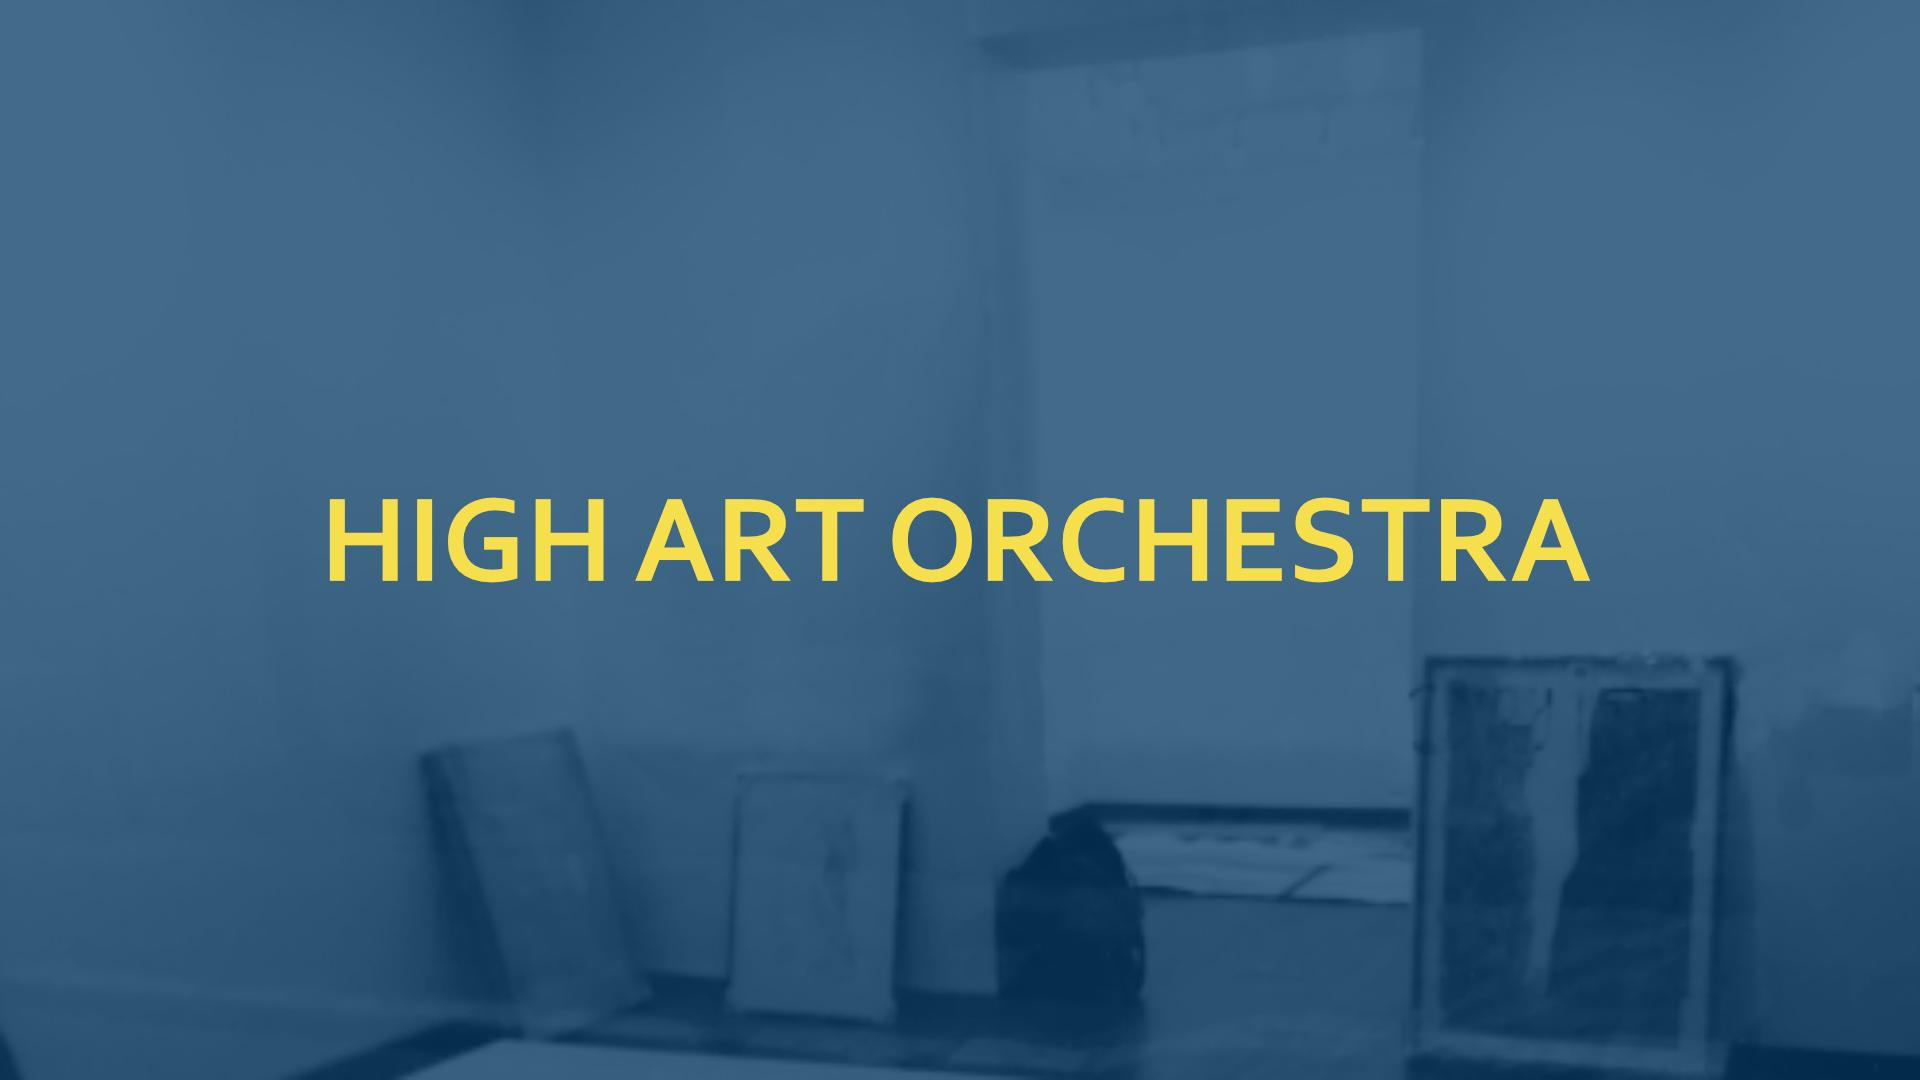 HIGH ART ORCHESTRA